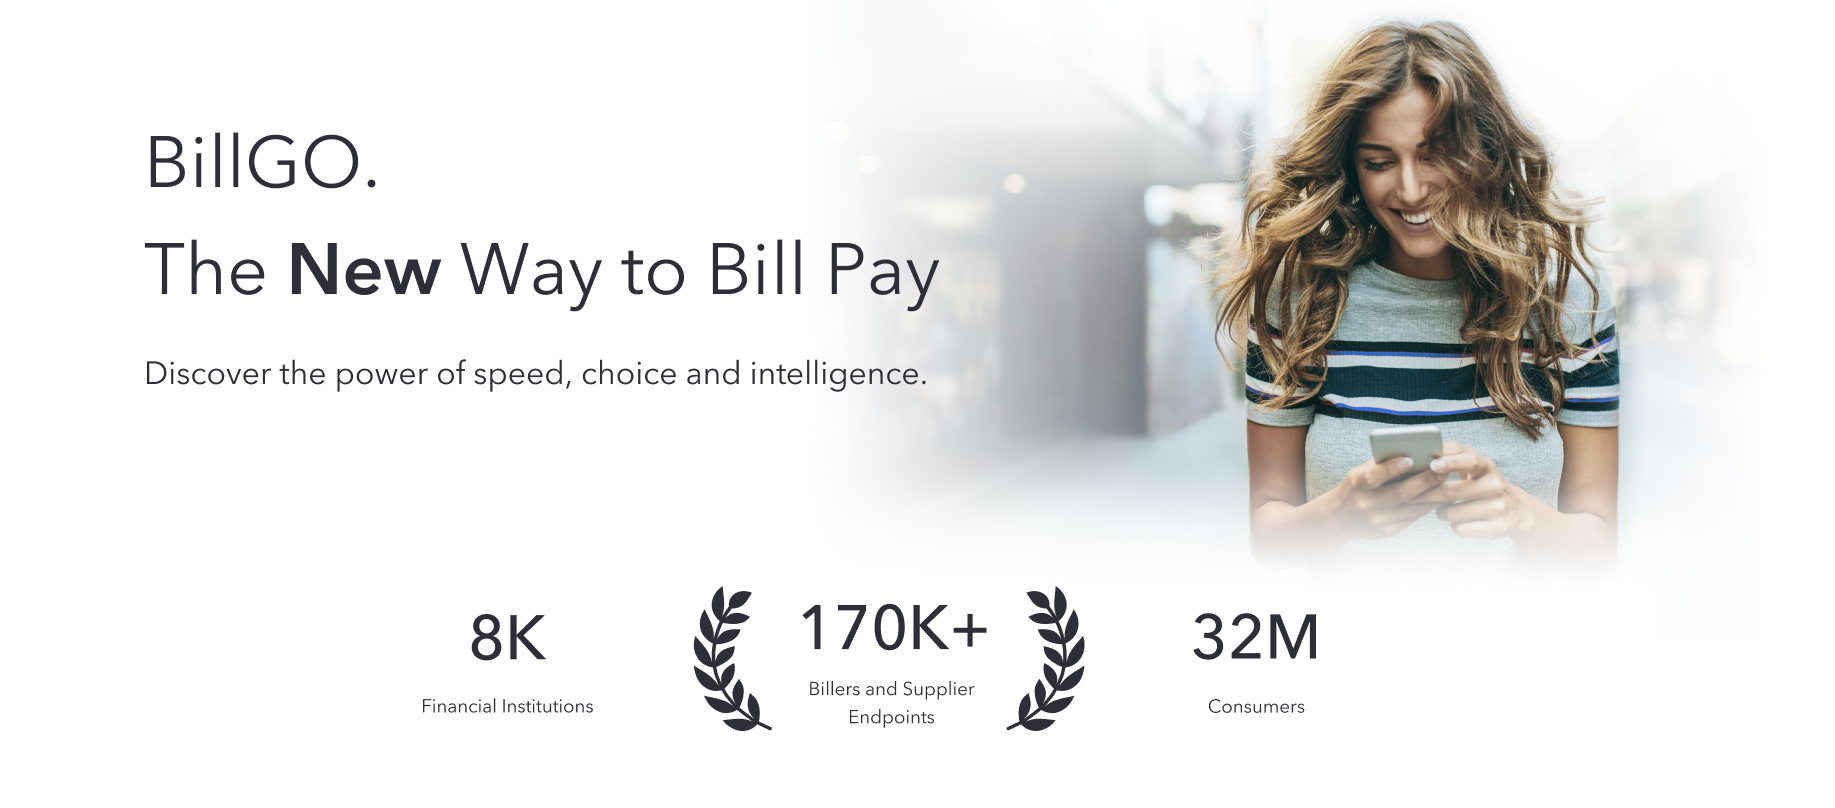 BillGO. The New Way to Bill Pay.